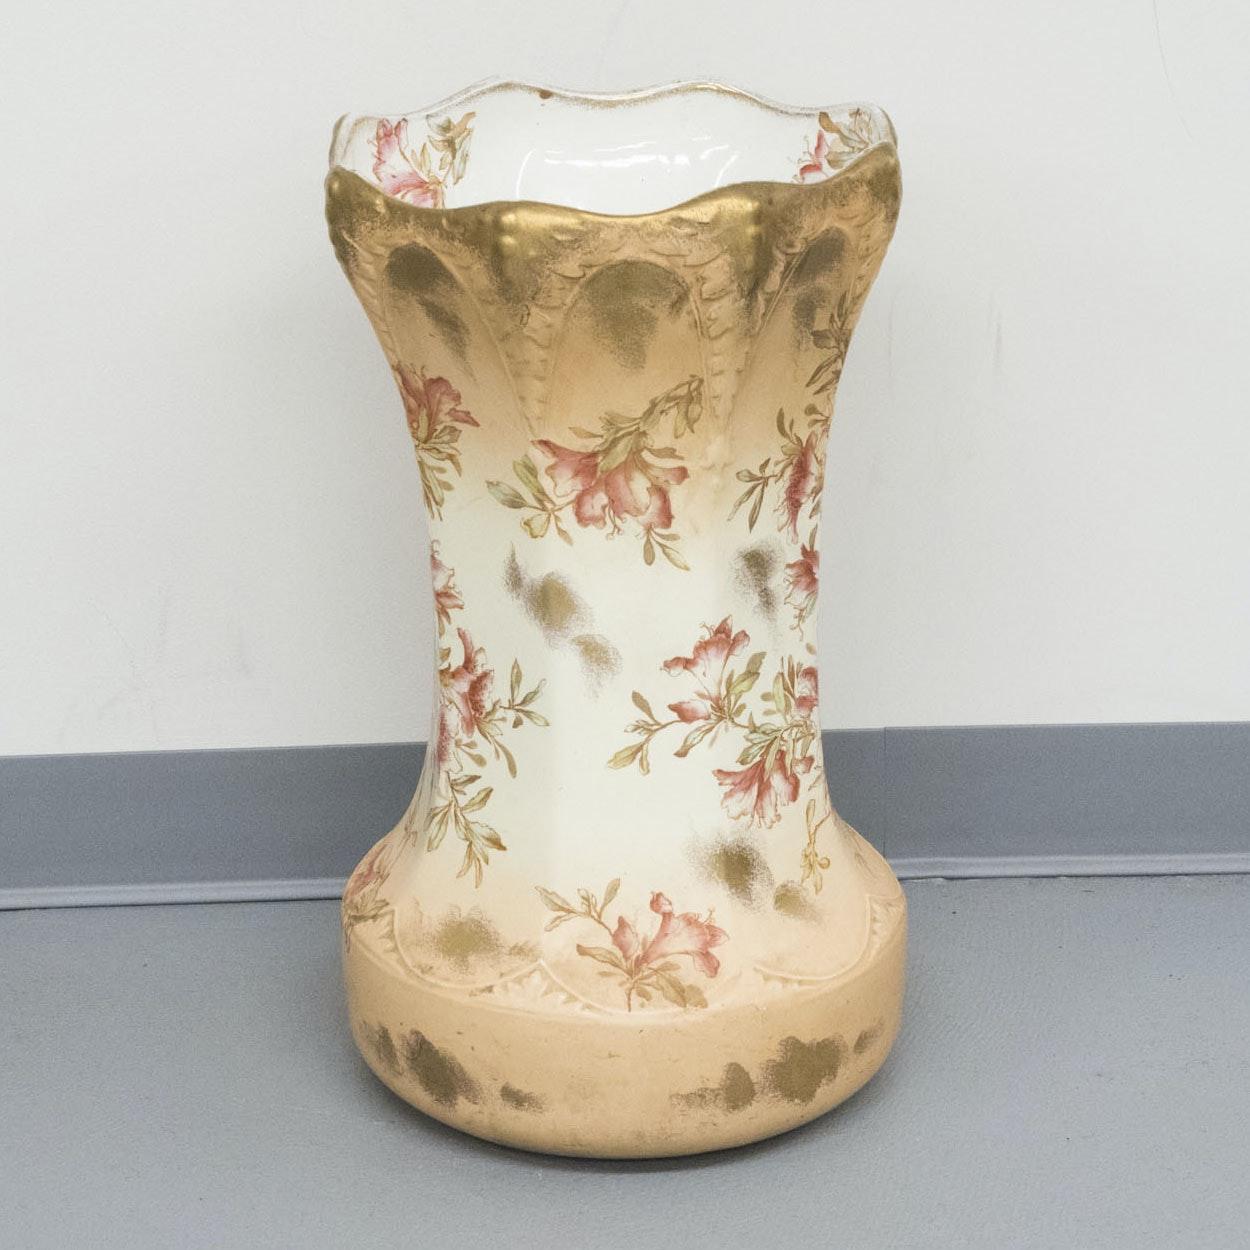 Maddock's Lamberton Works Royal Porcelain Vase